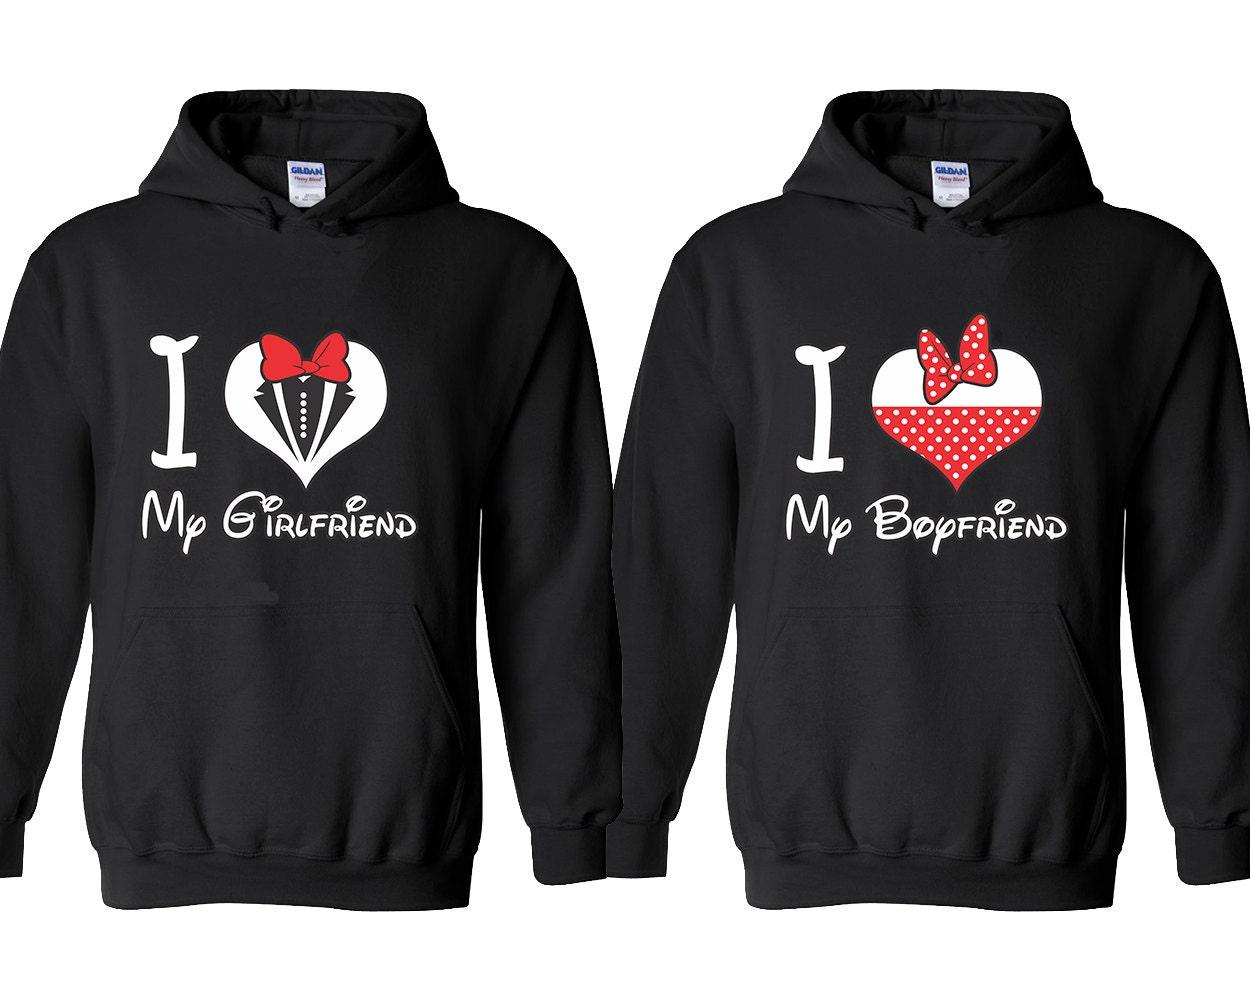 I Love My Girlfriend Boyfriend HEART Couple Hoodies Matching